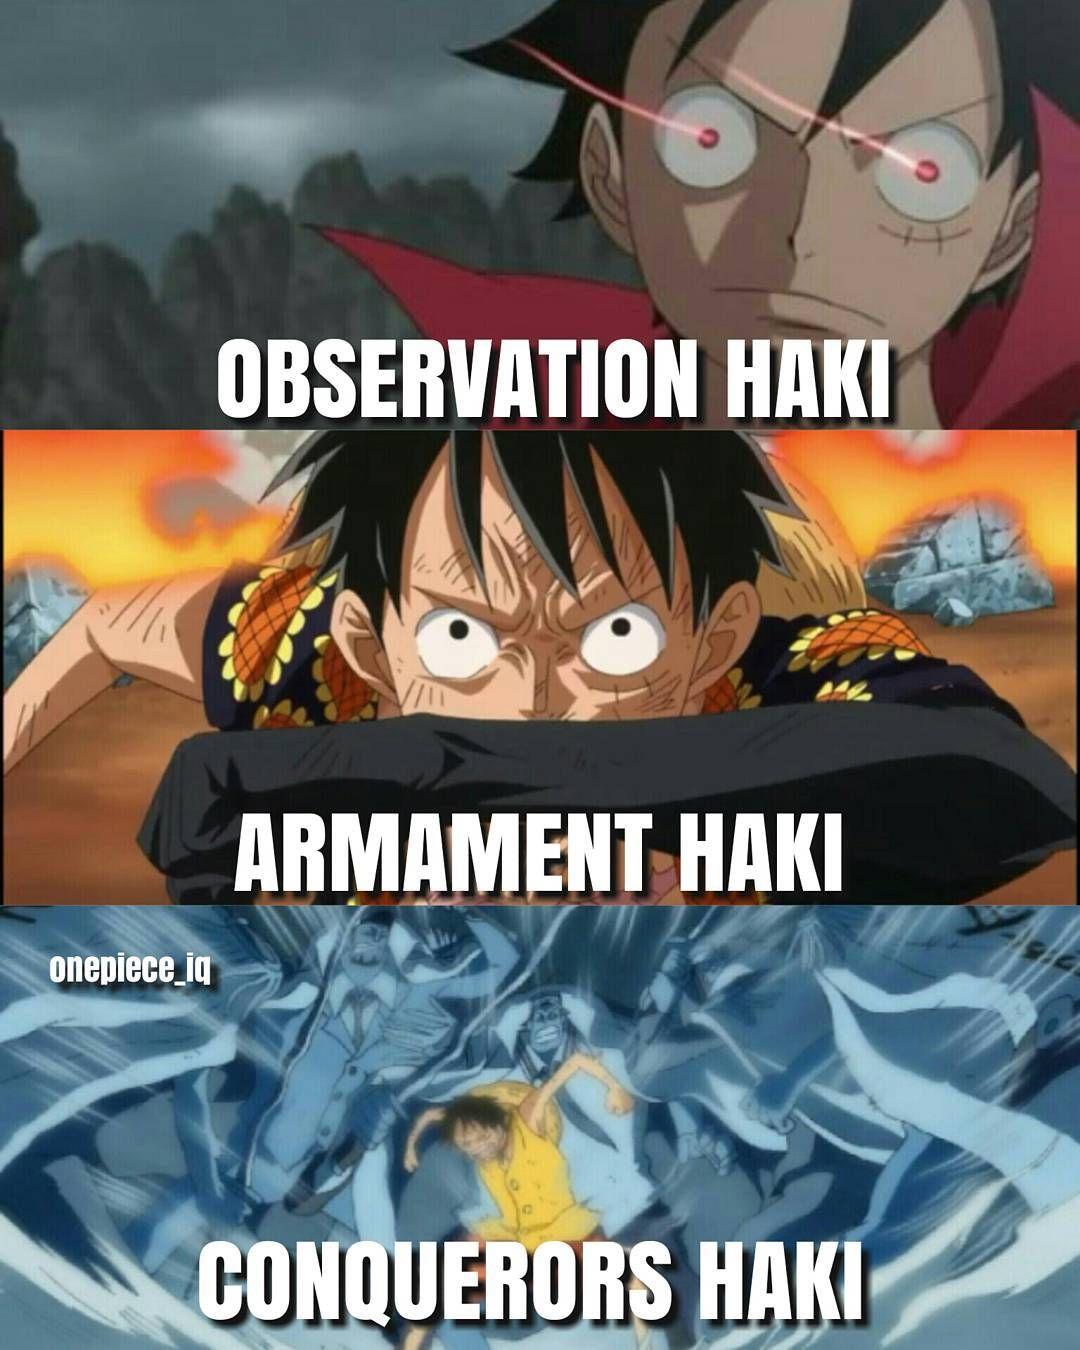 one piece zoro and sanji haki